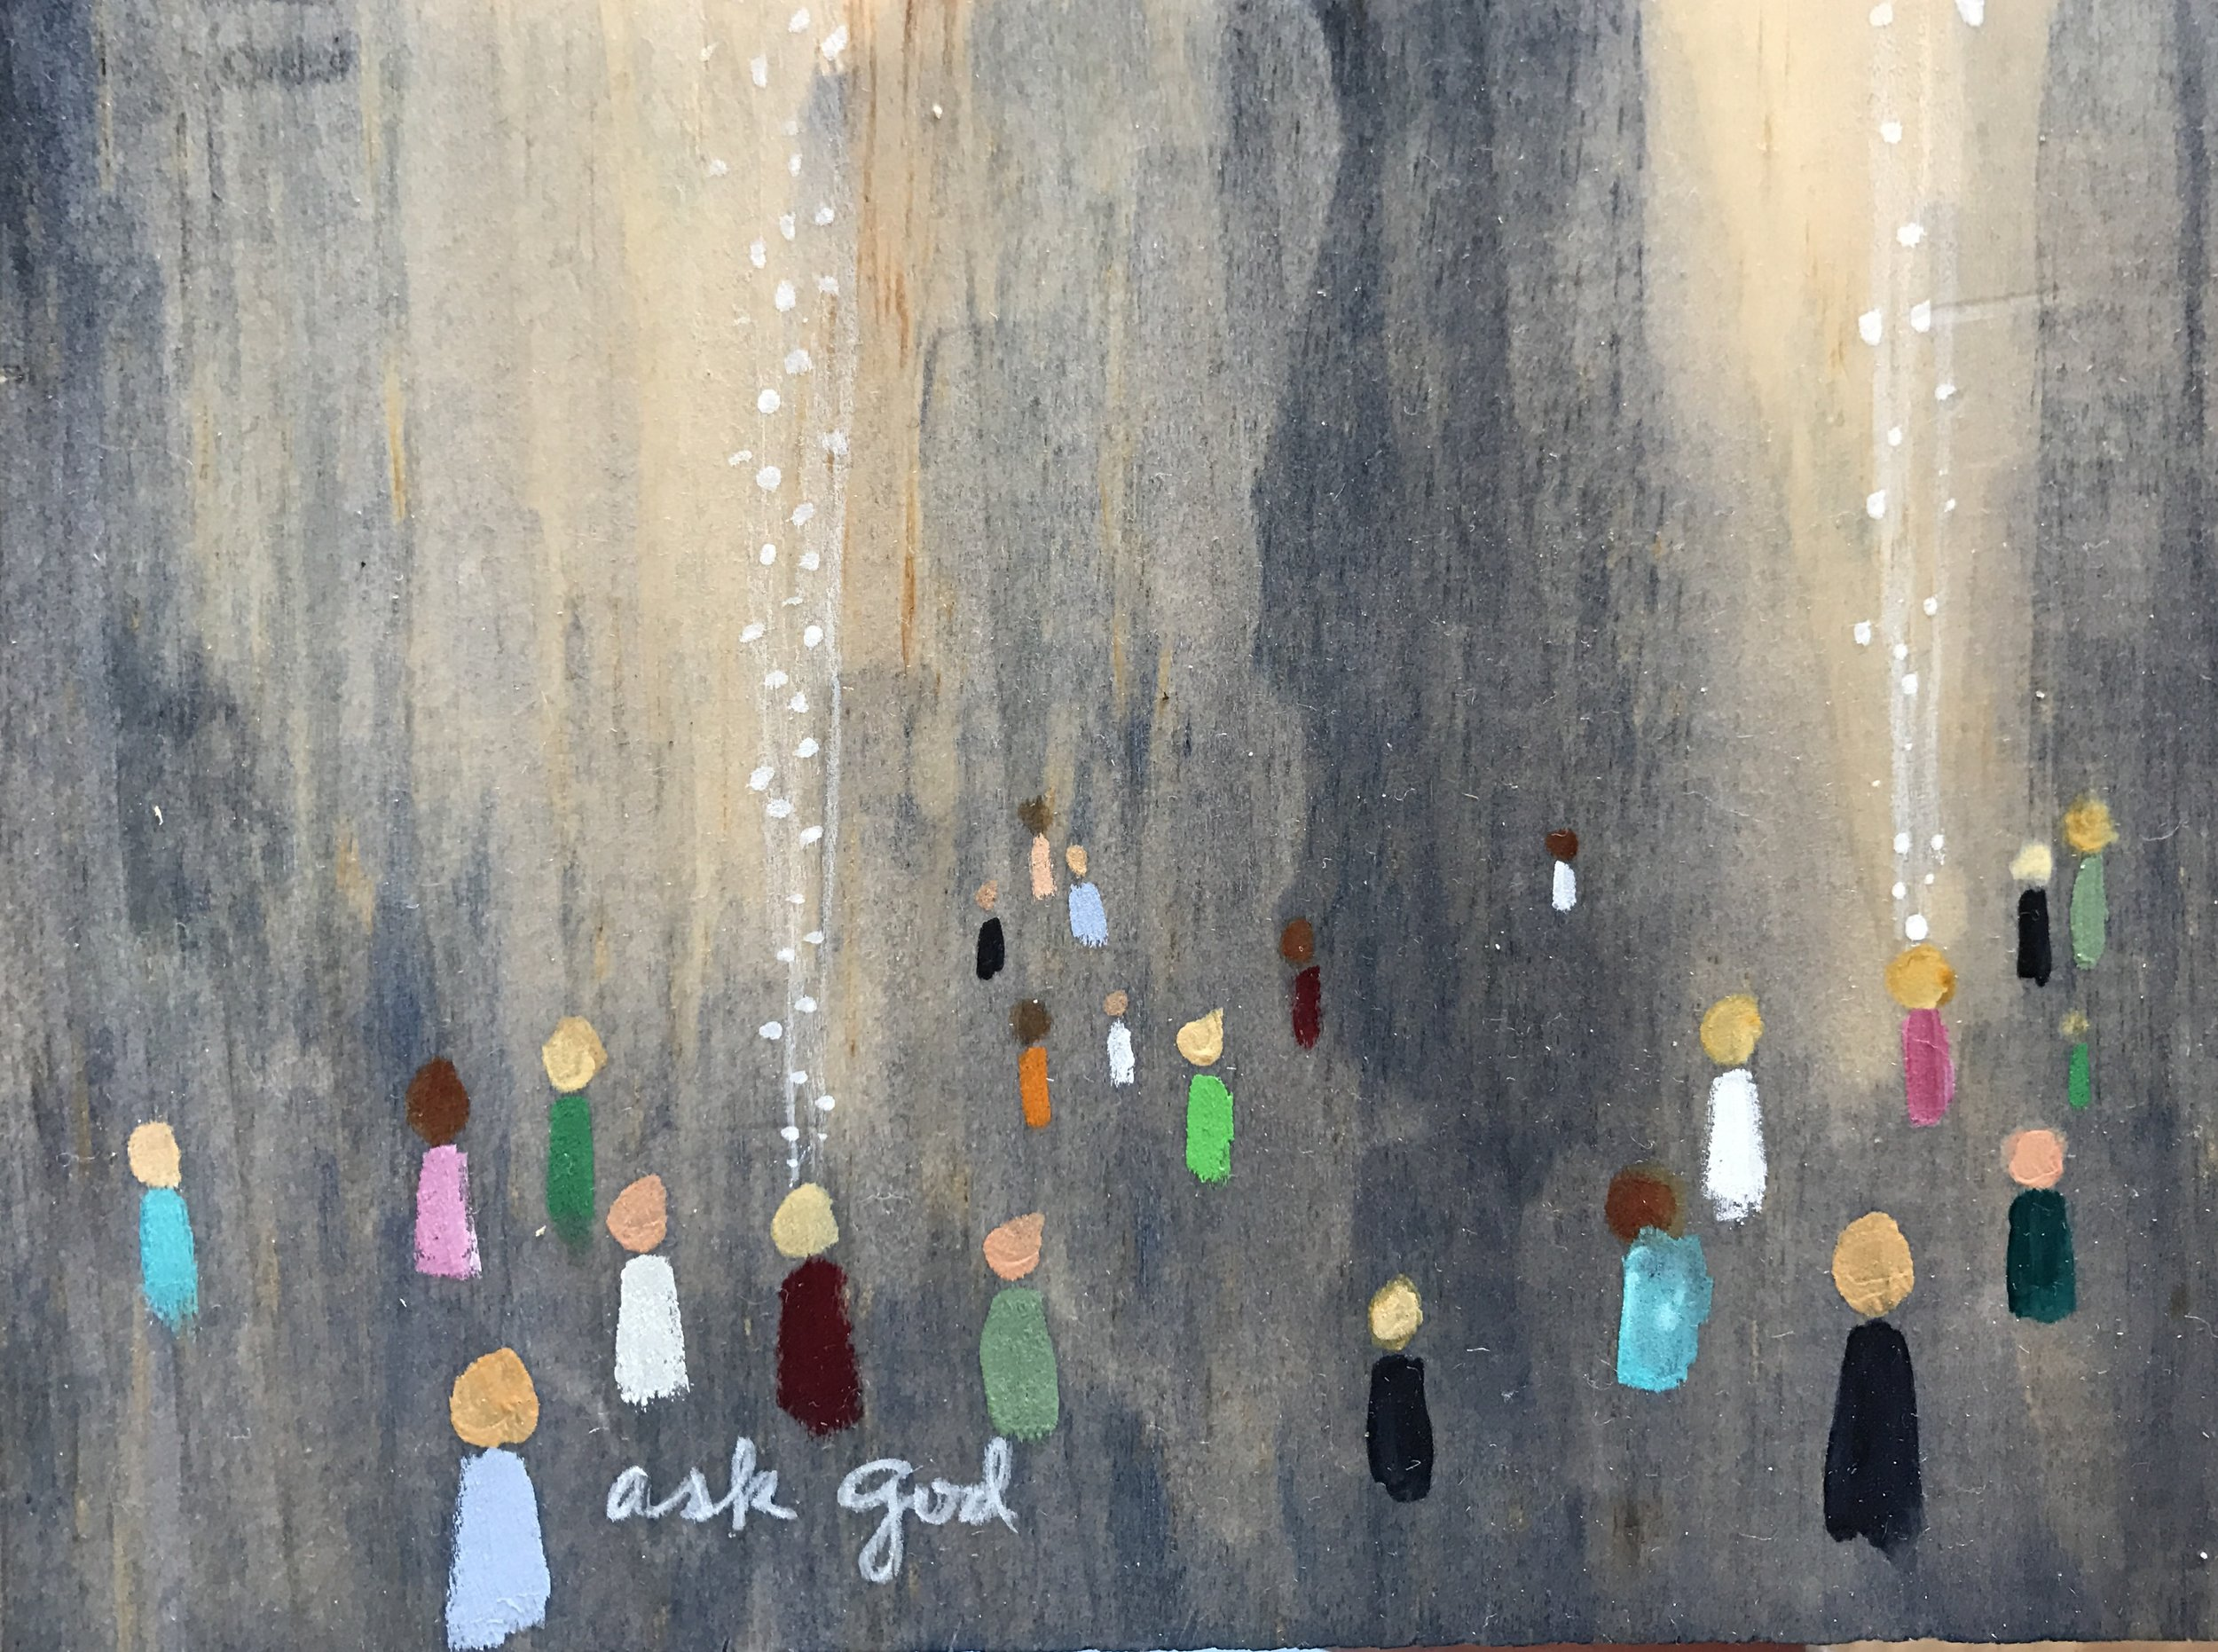 ask god IV